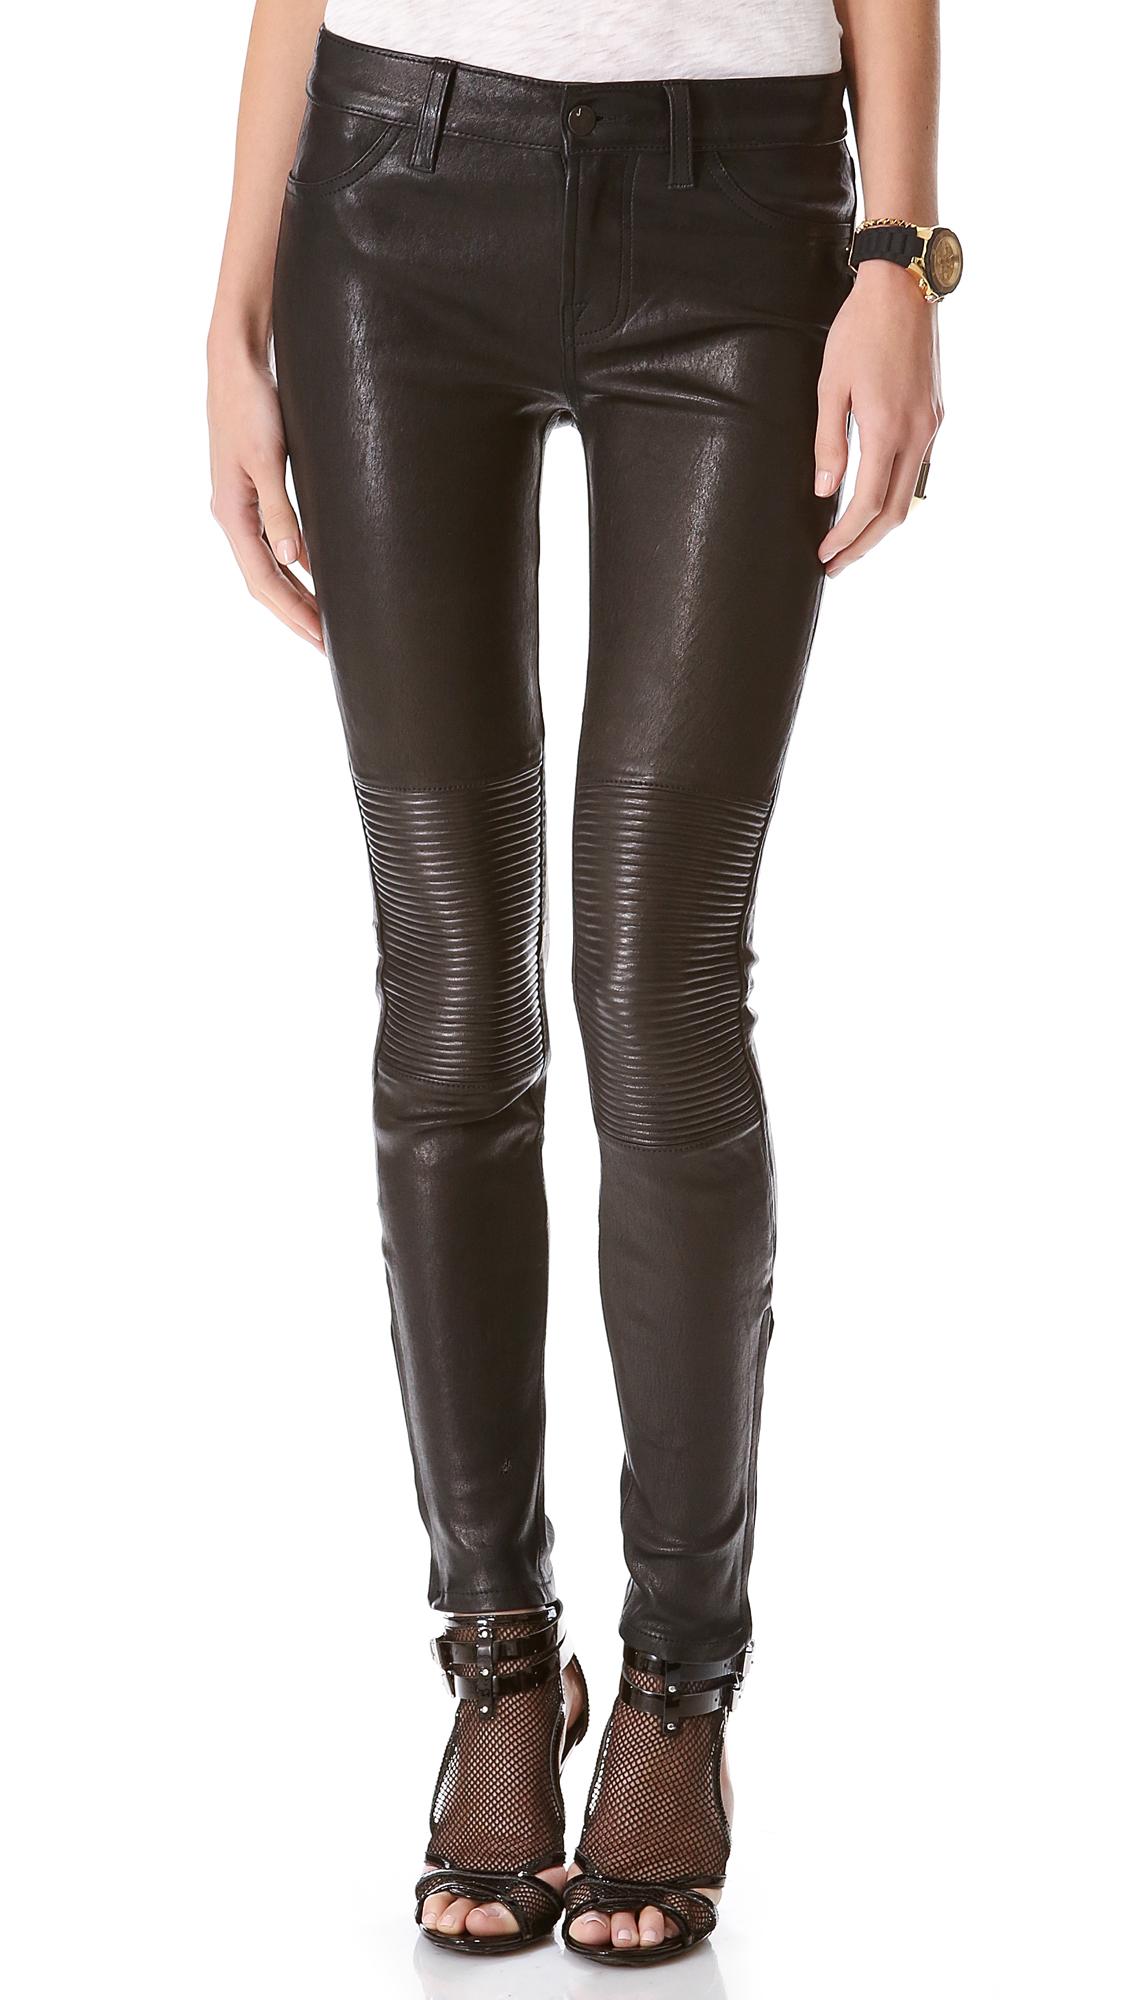 Lyst - J Brand Nicola Leather Moto Pants in Black